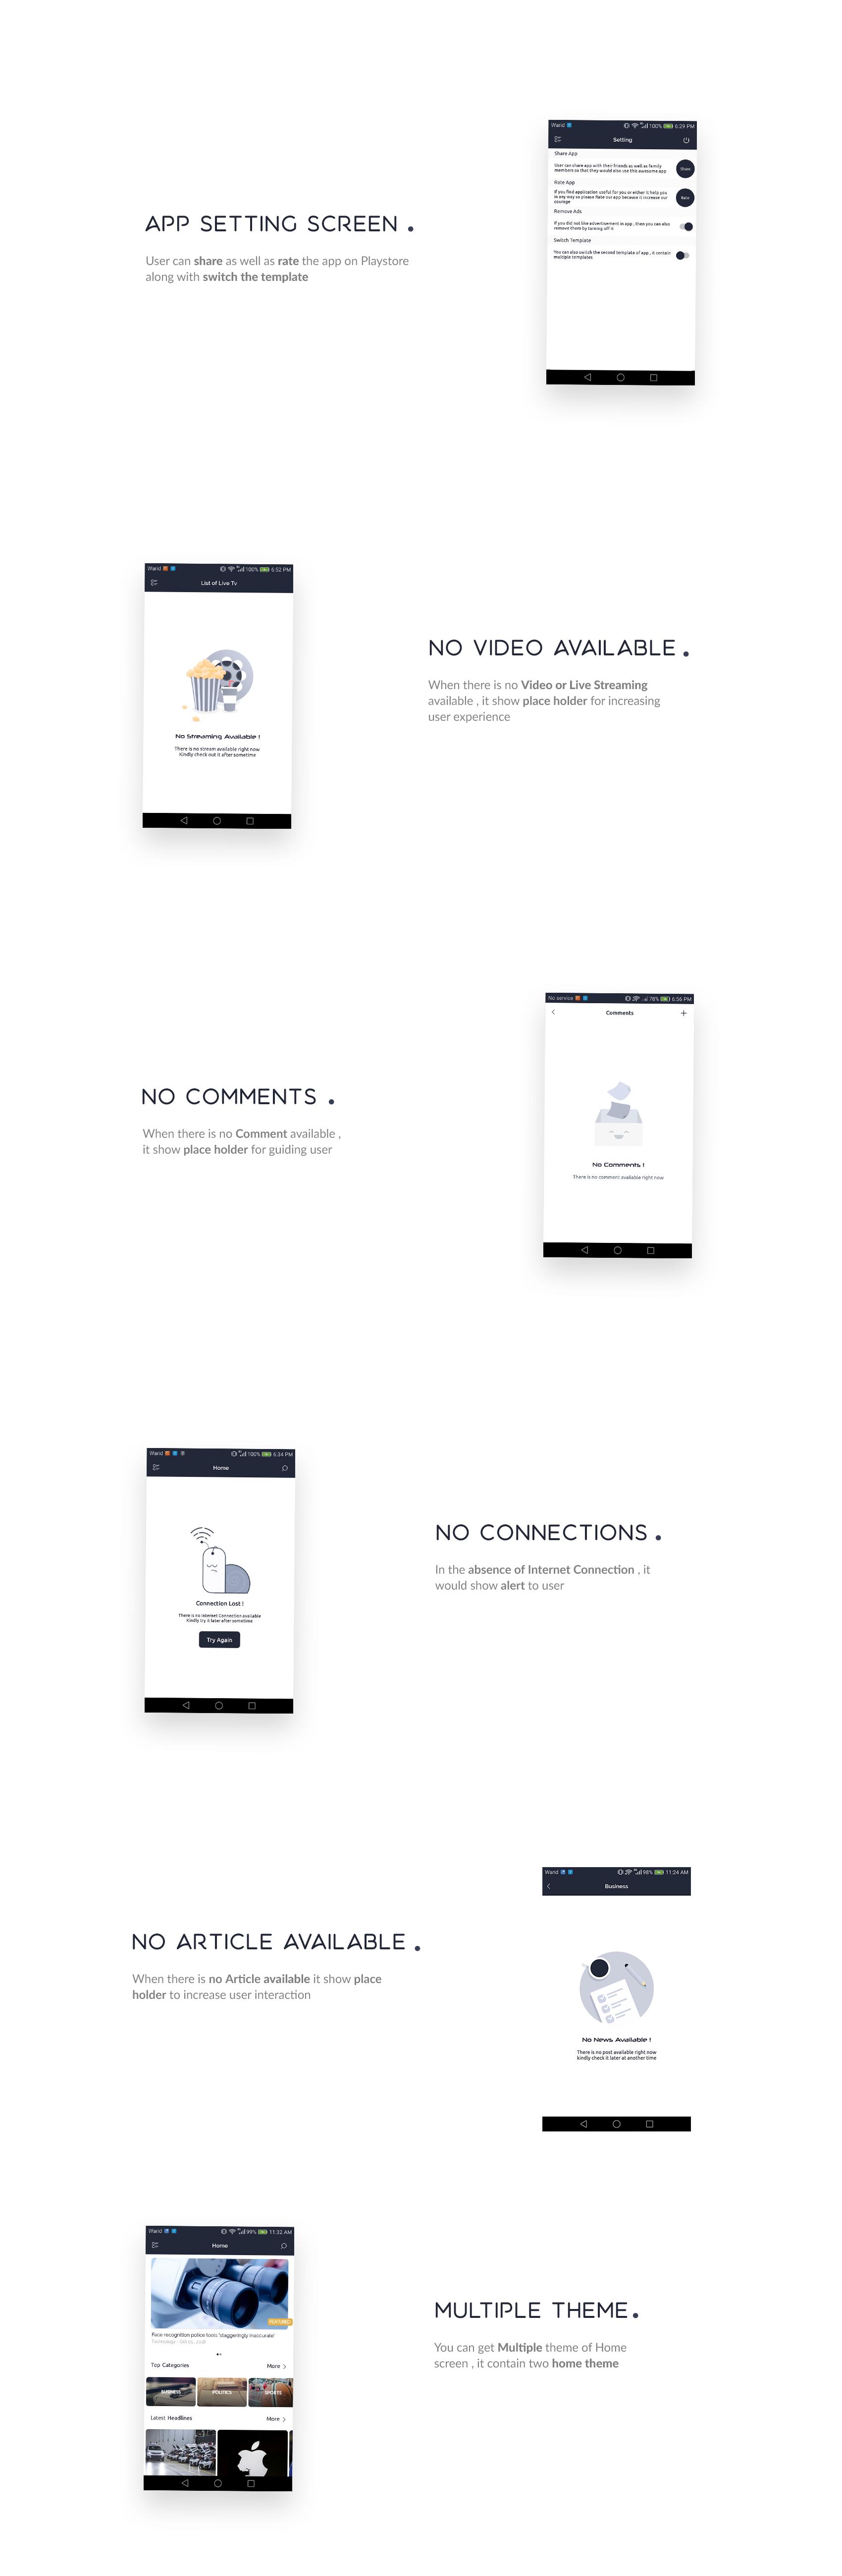 Newsy - Full Featured Native WordPress App - 3